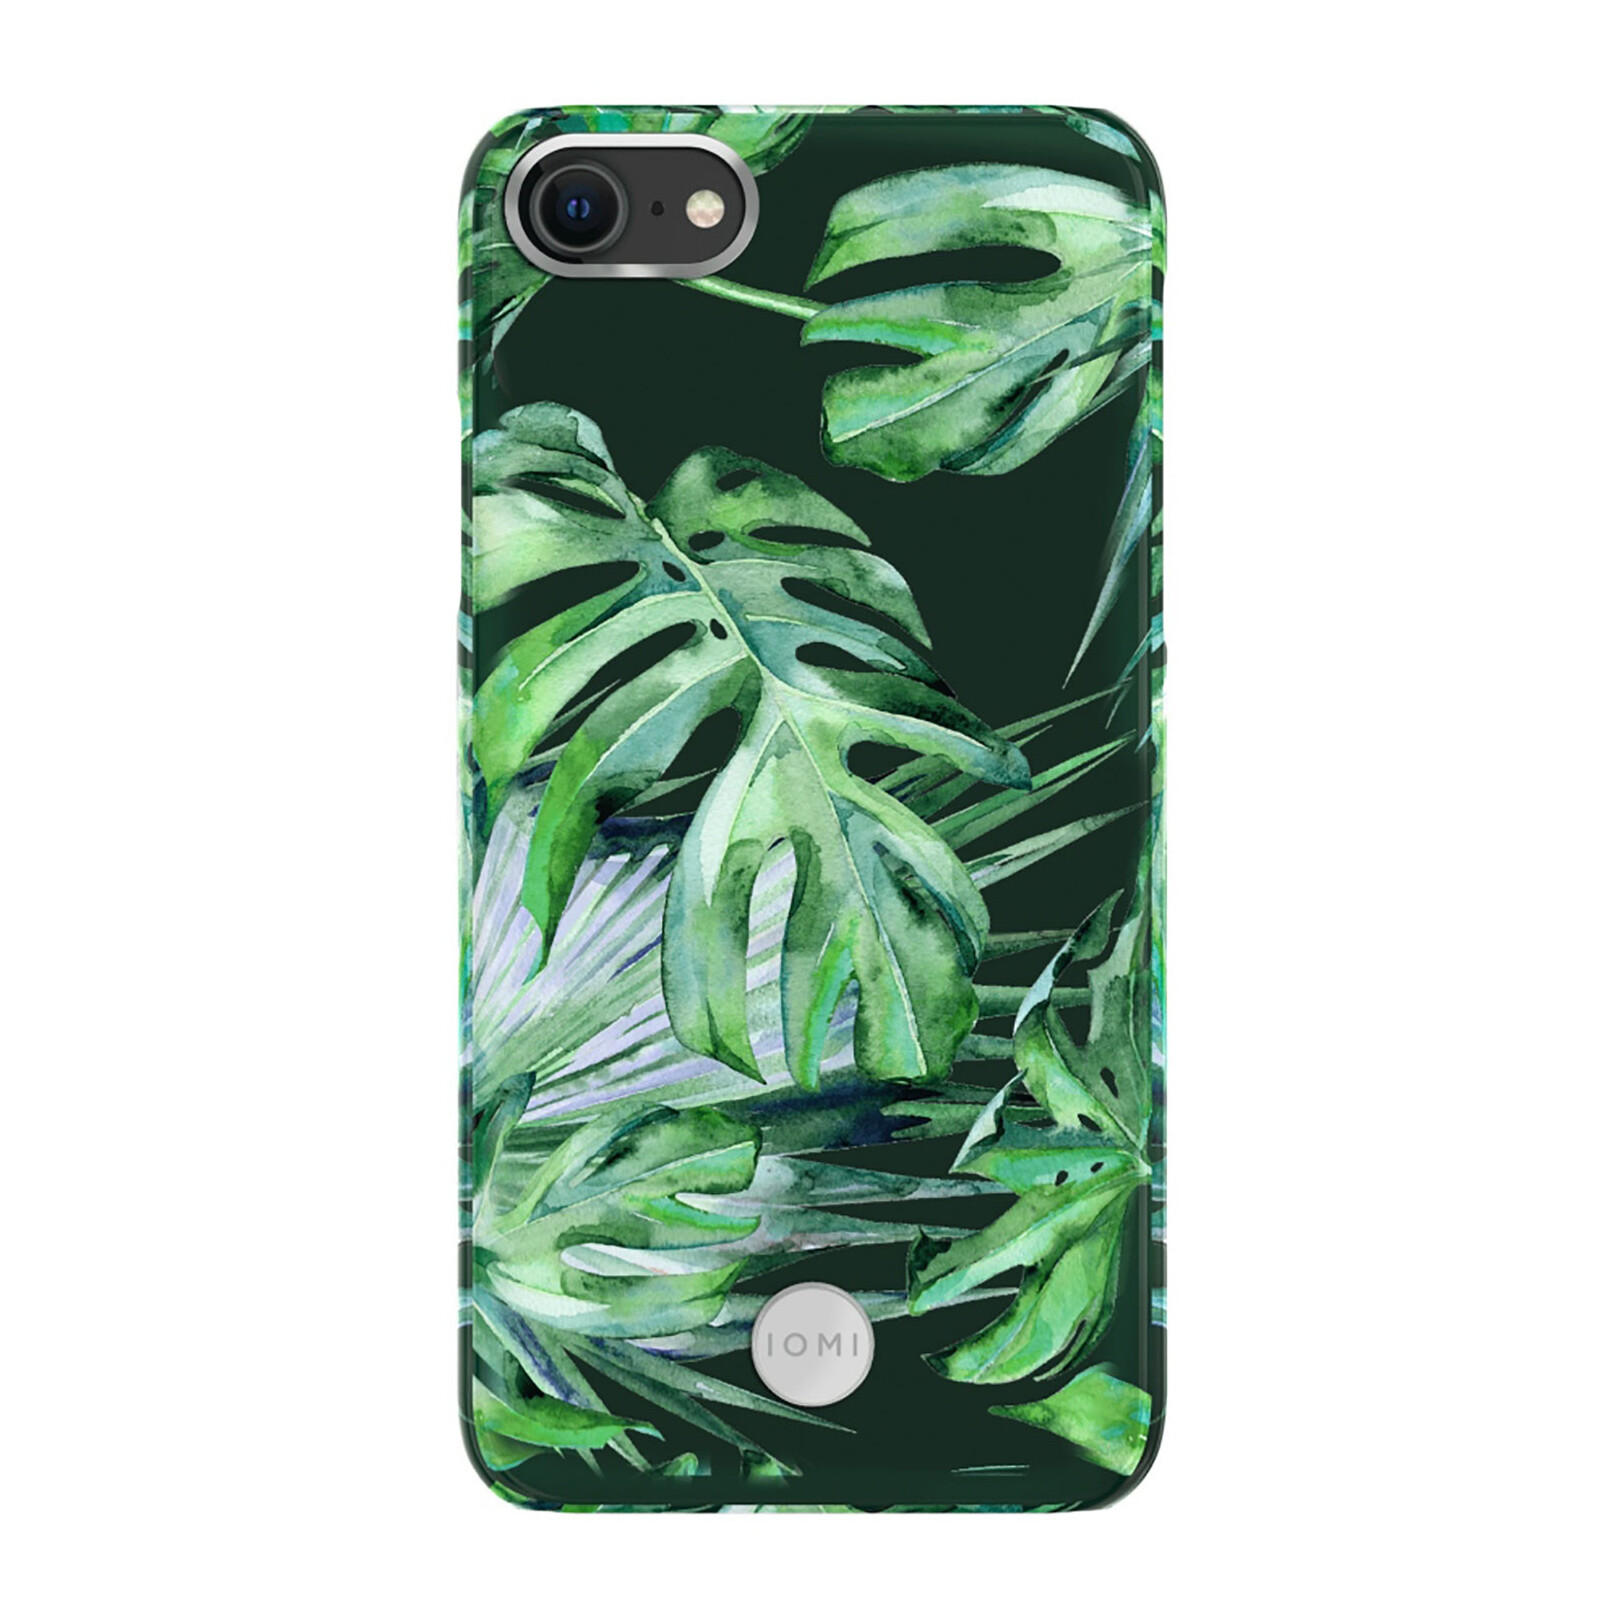 IOMI Back Design Apple iPhone 7/8/SE 2020 plant green